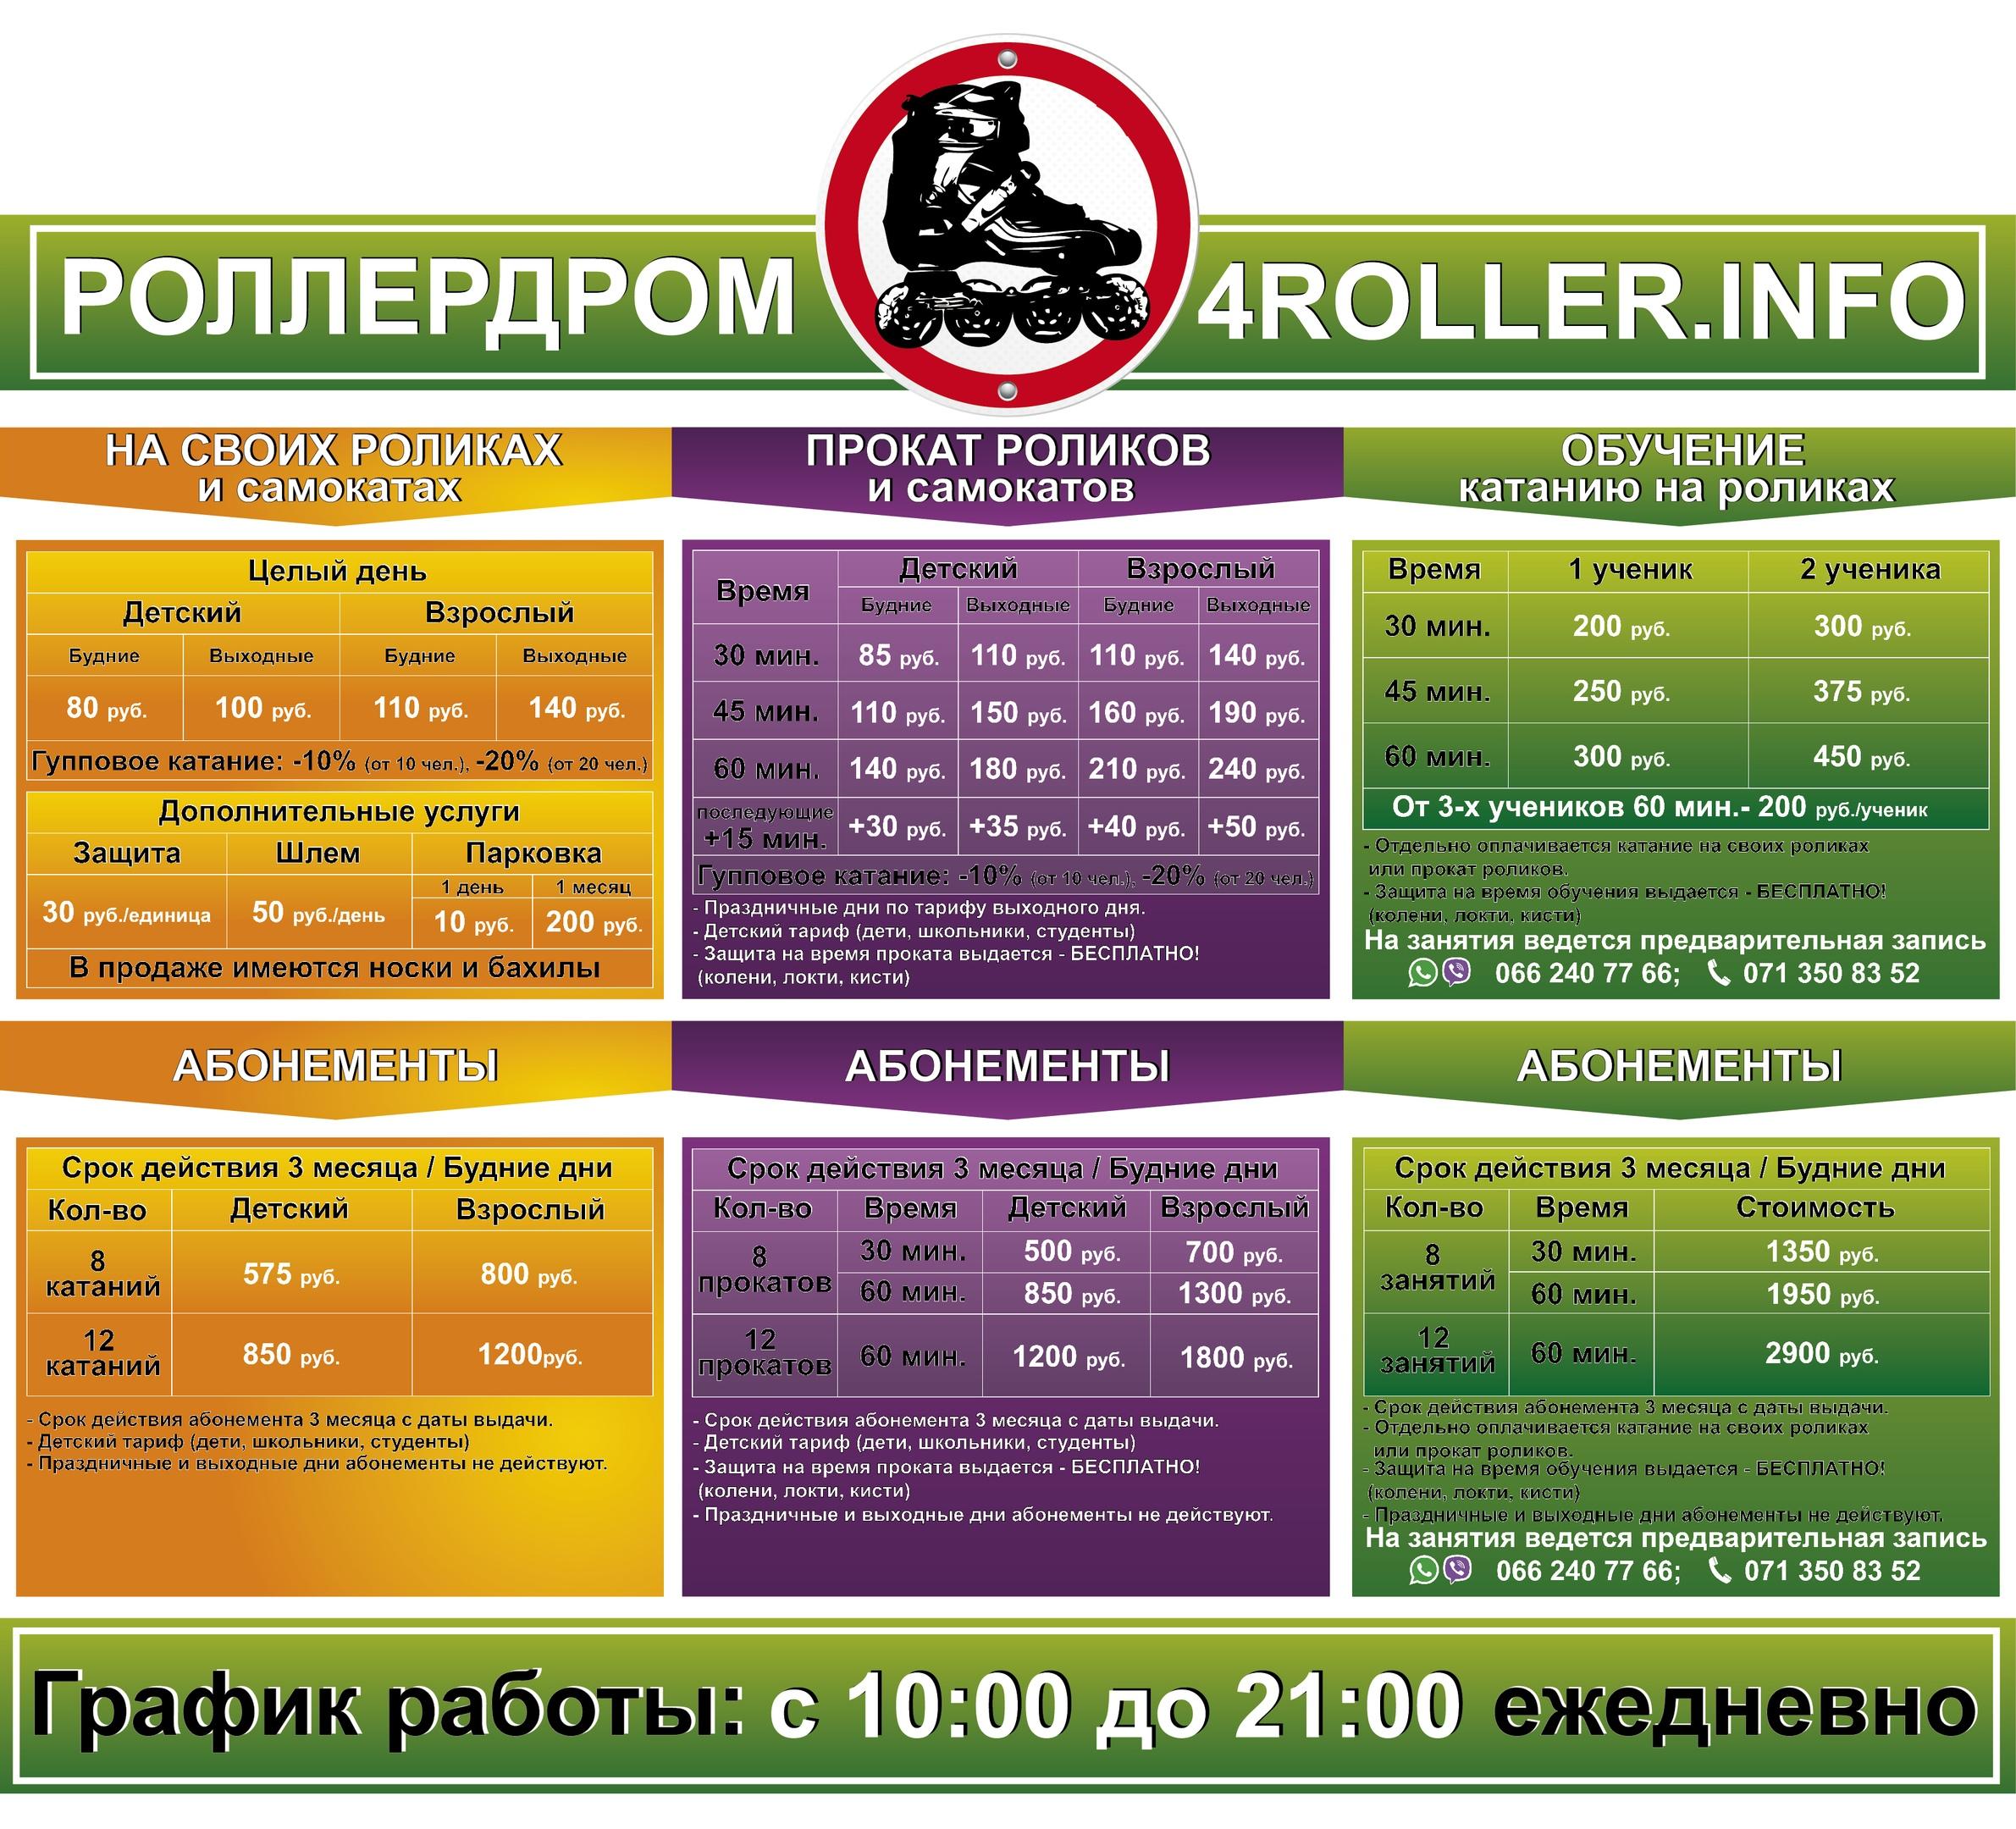 Цены на услуги роллердрома #4rollerinfo